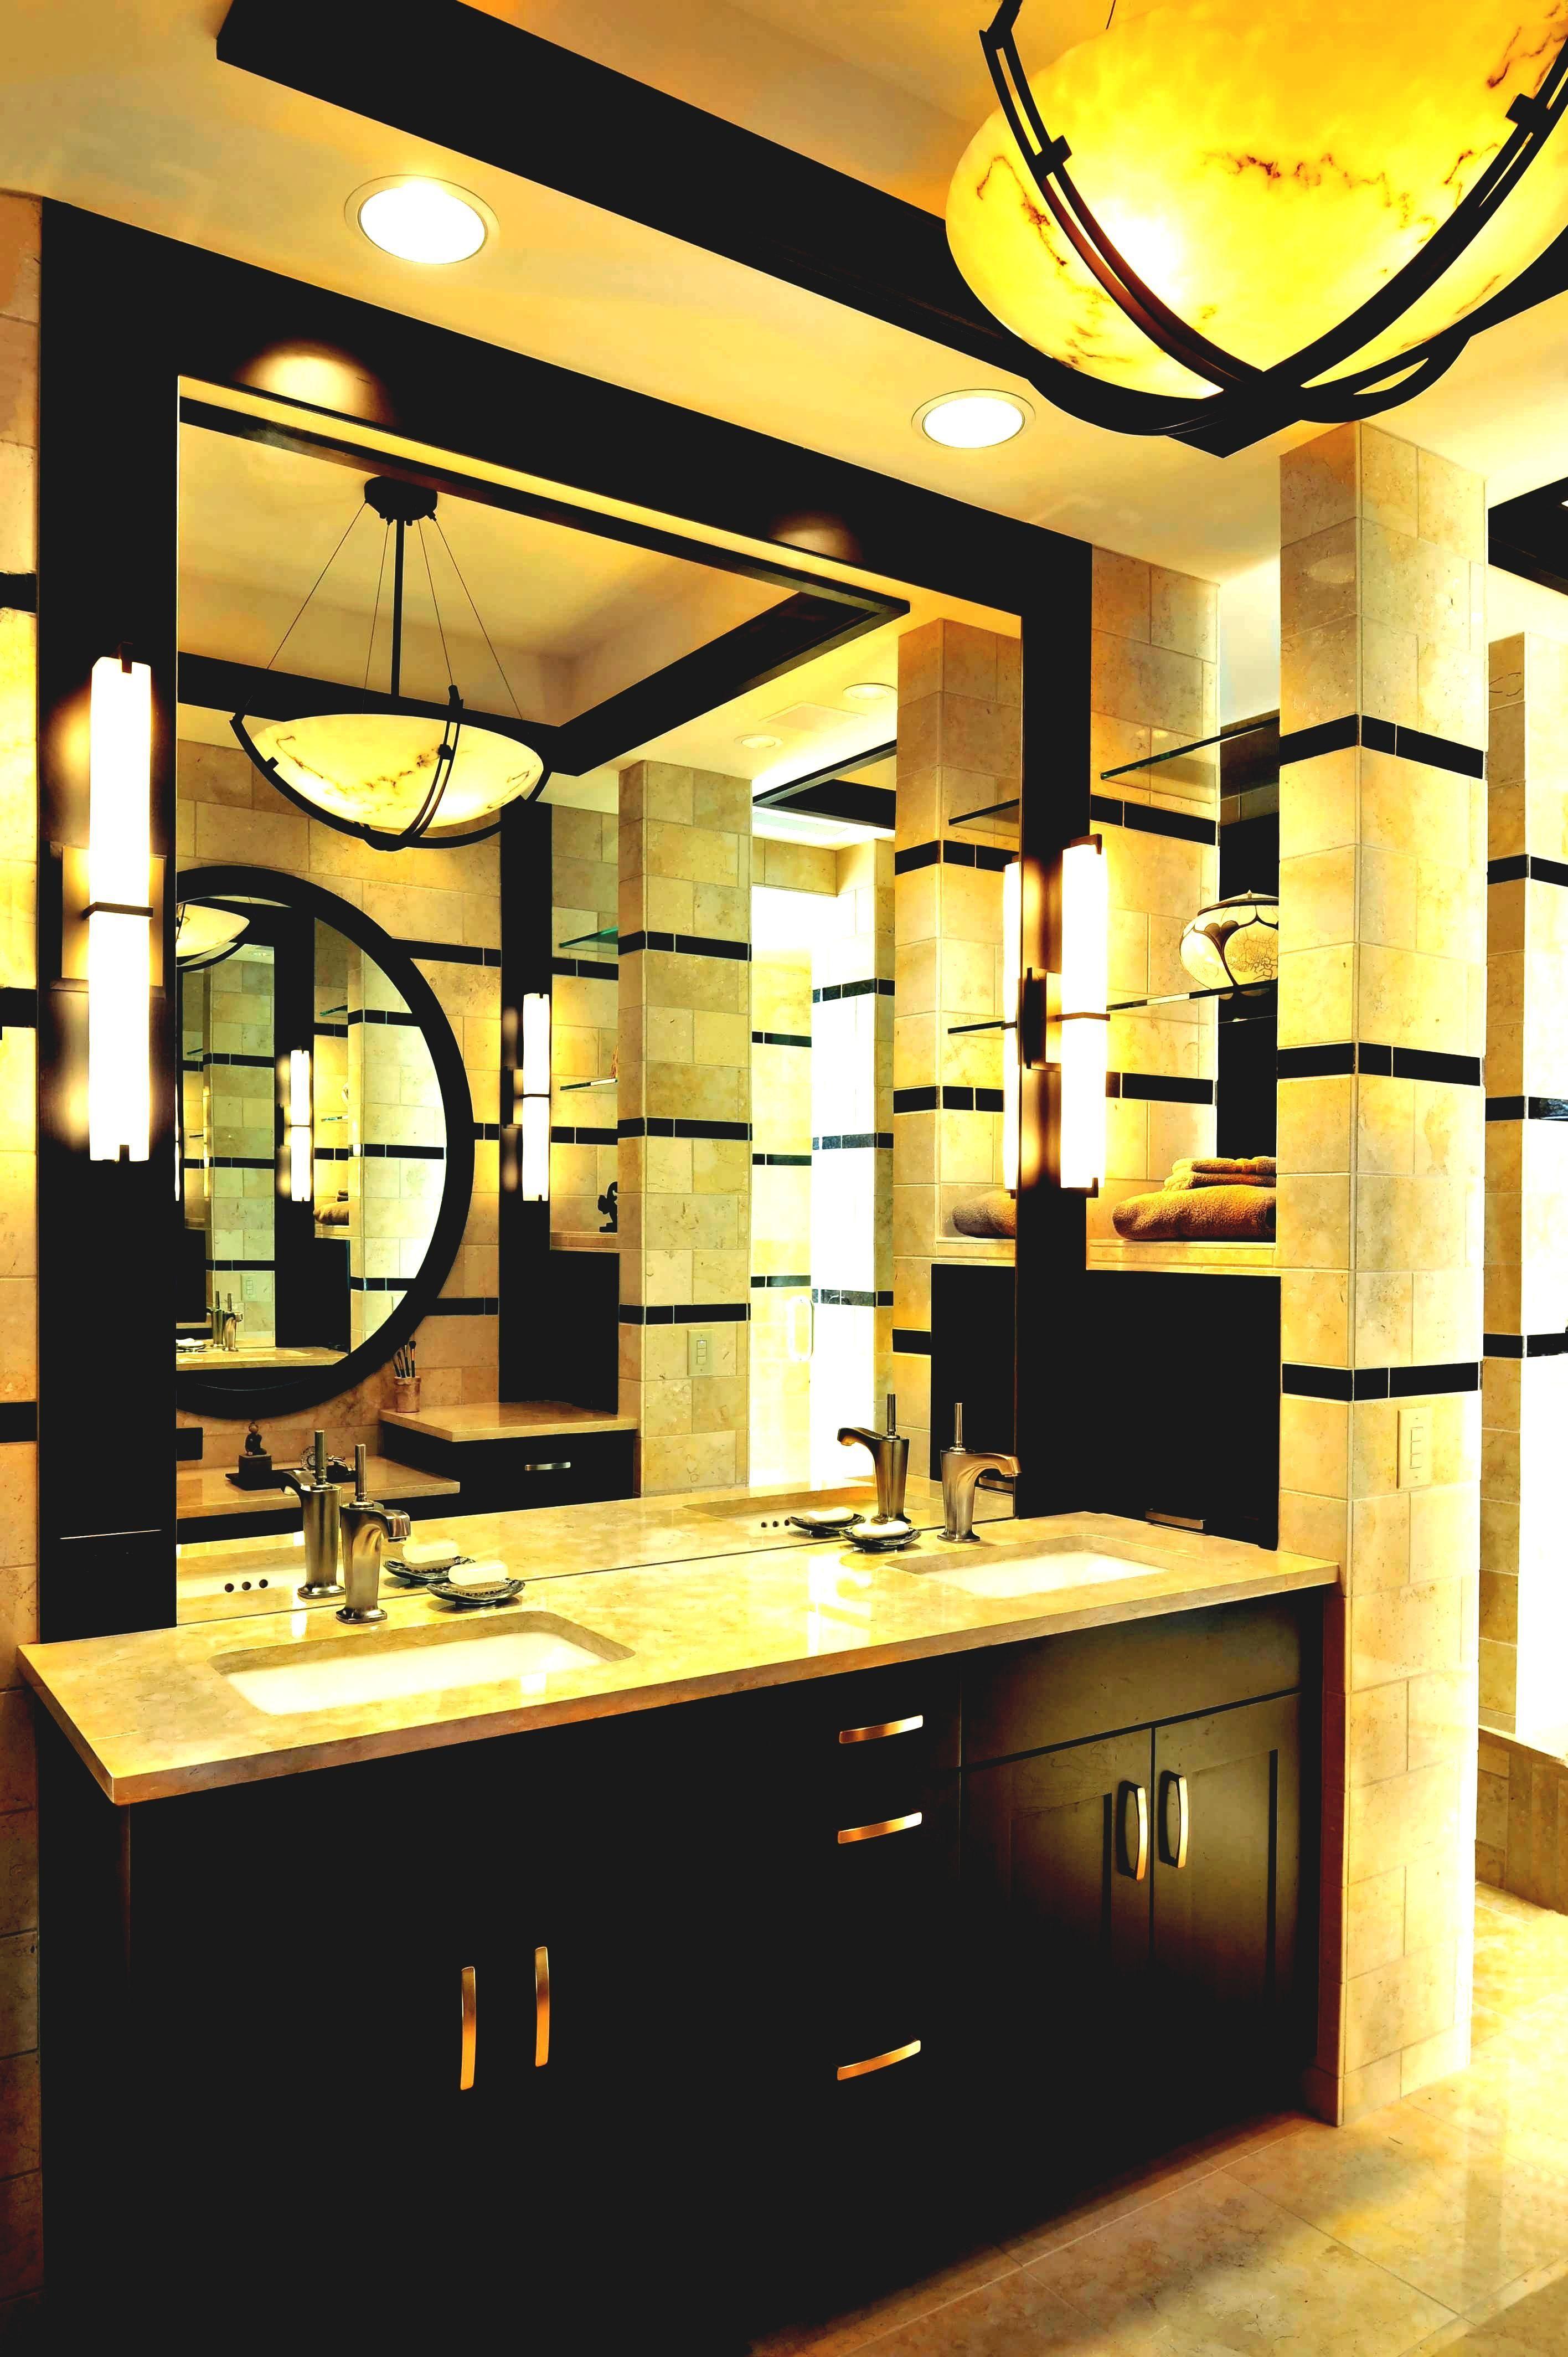 Master Bath Vanity 2 Mirrors 1 Light Fixture Dining Room Wainscoting Bathroom Wallpaper Bathroom Interior